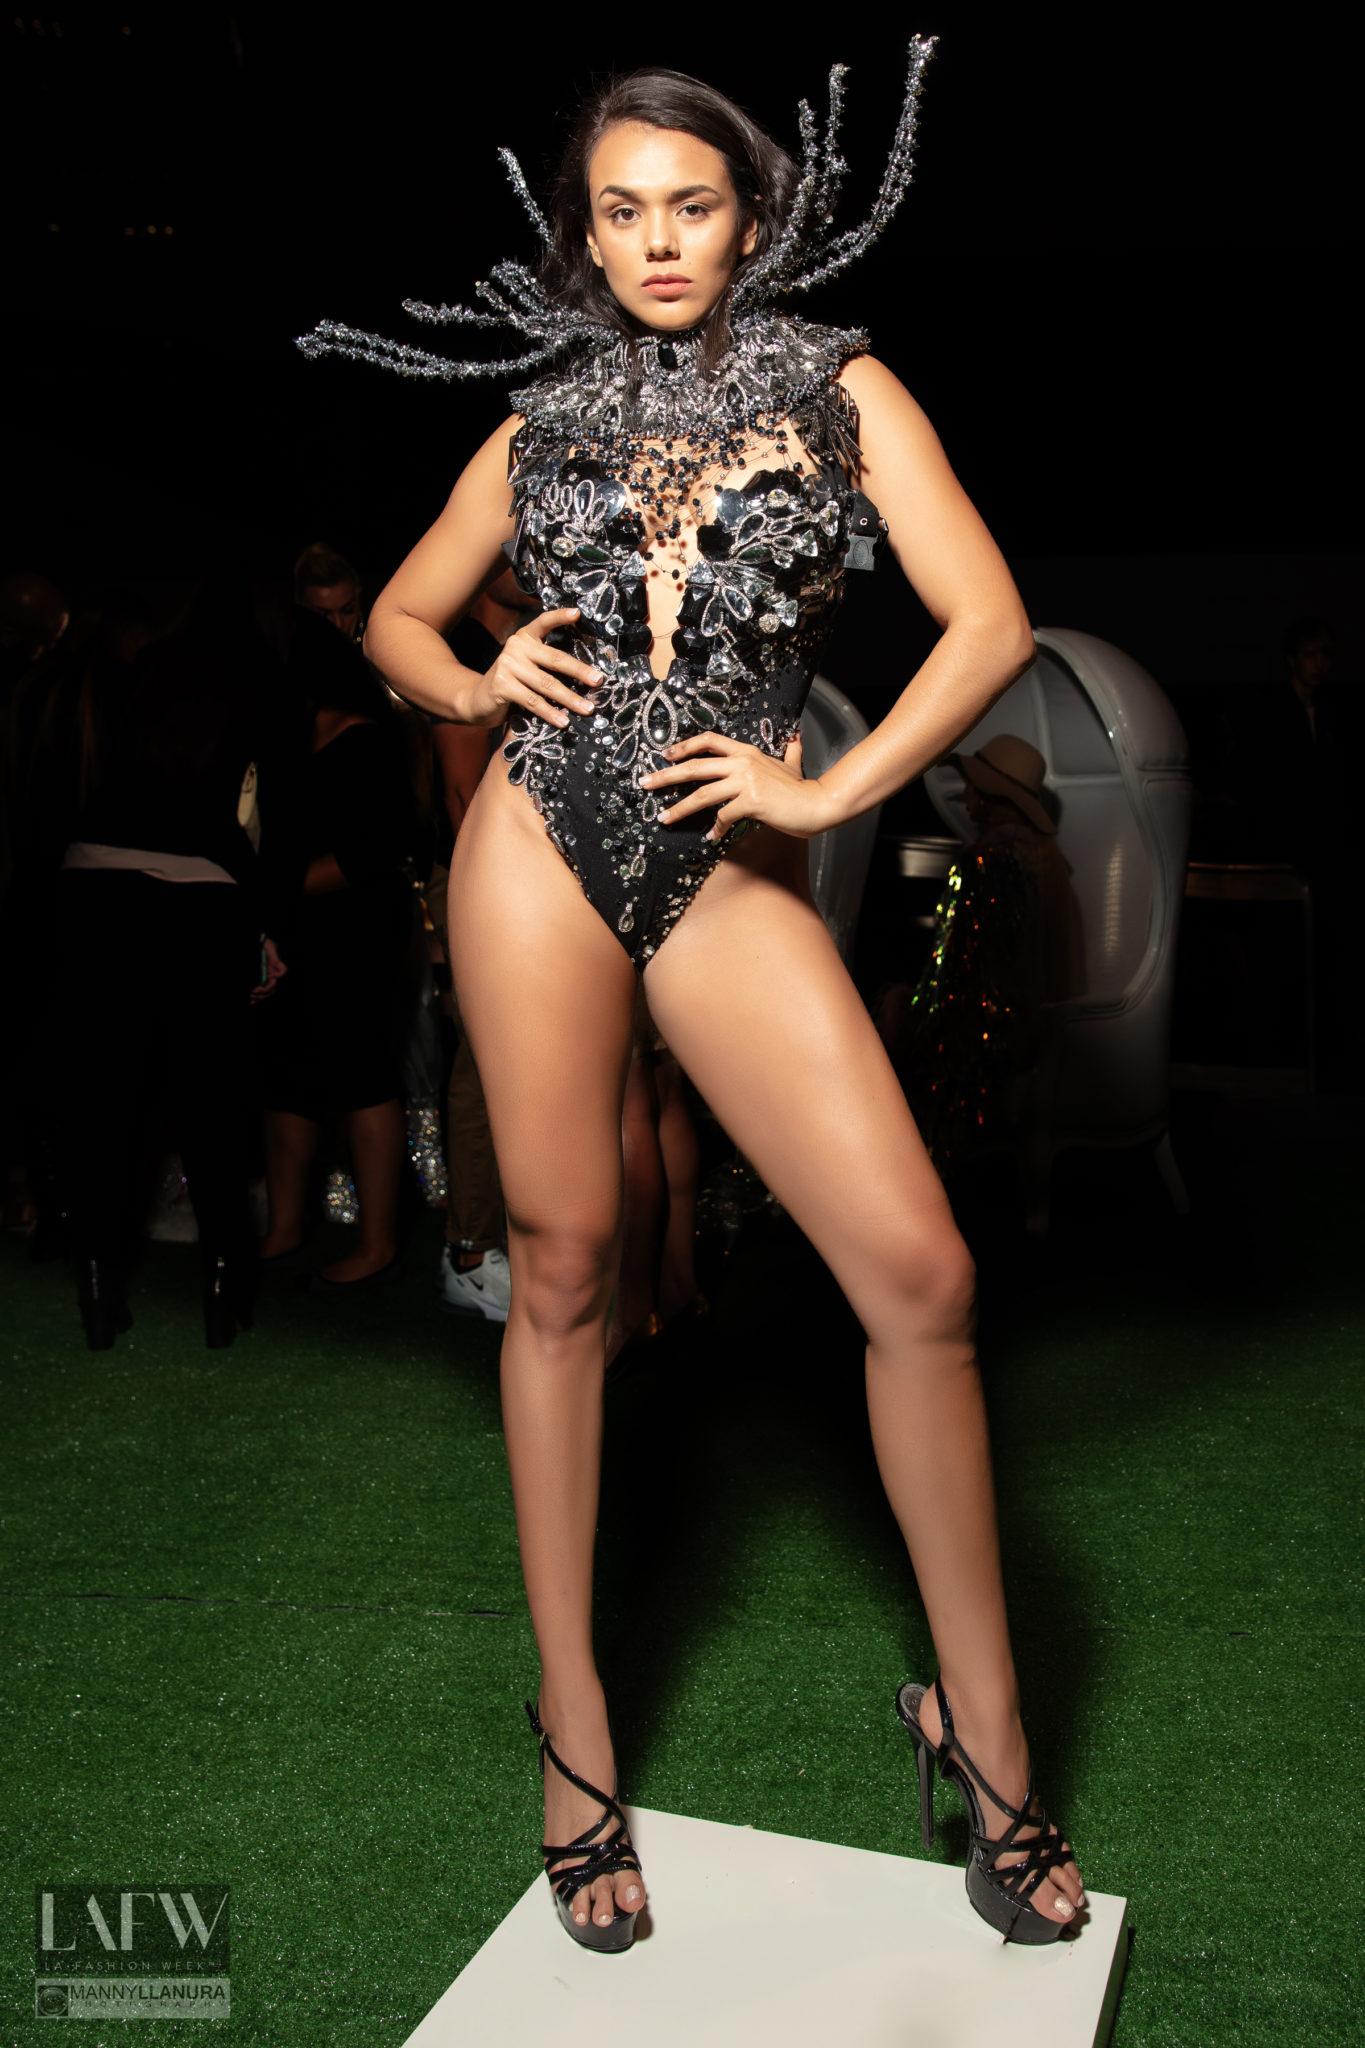 LAFW LA Fashion Week SS19 Rocky Gathercole